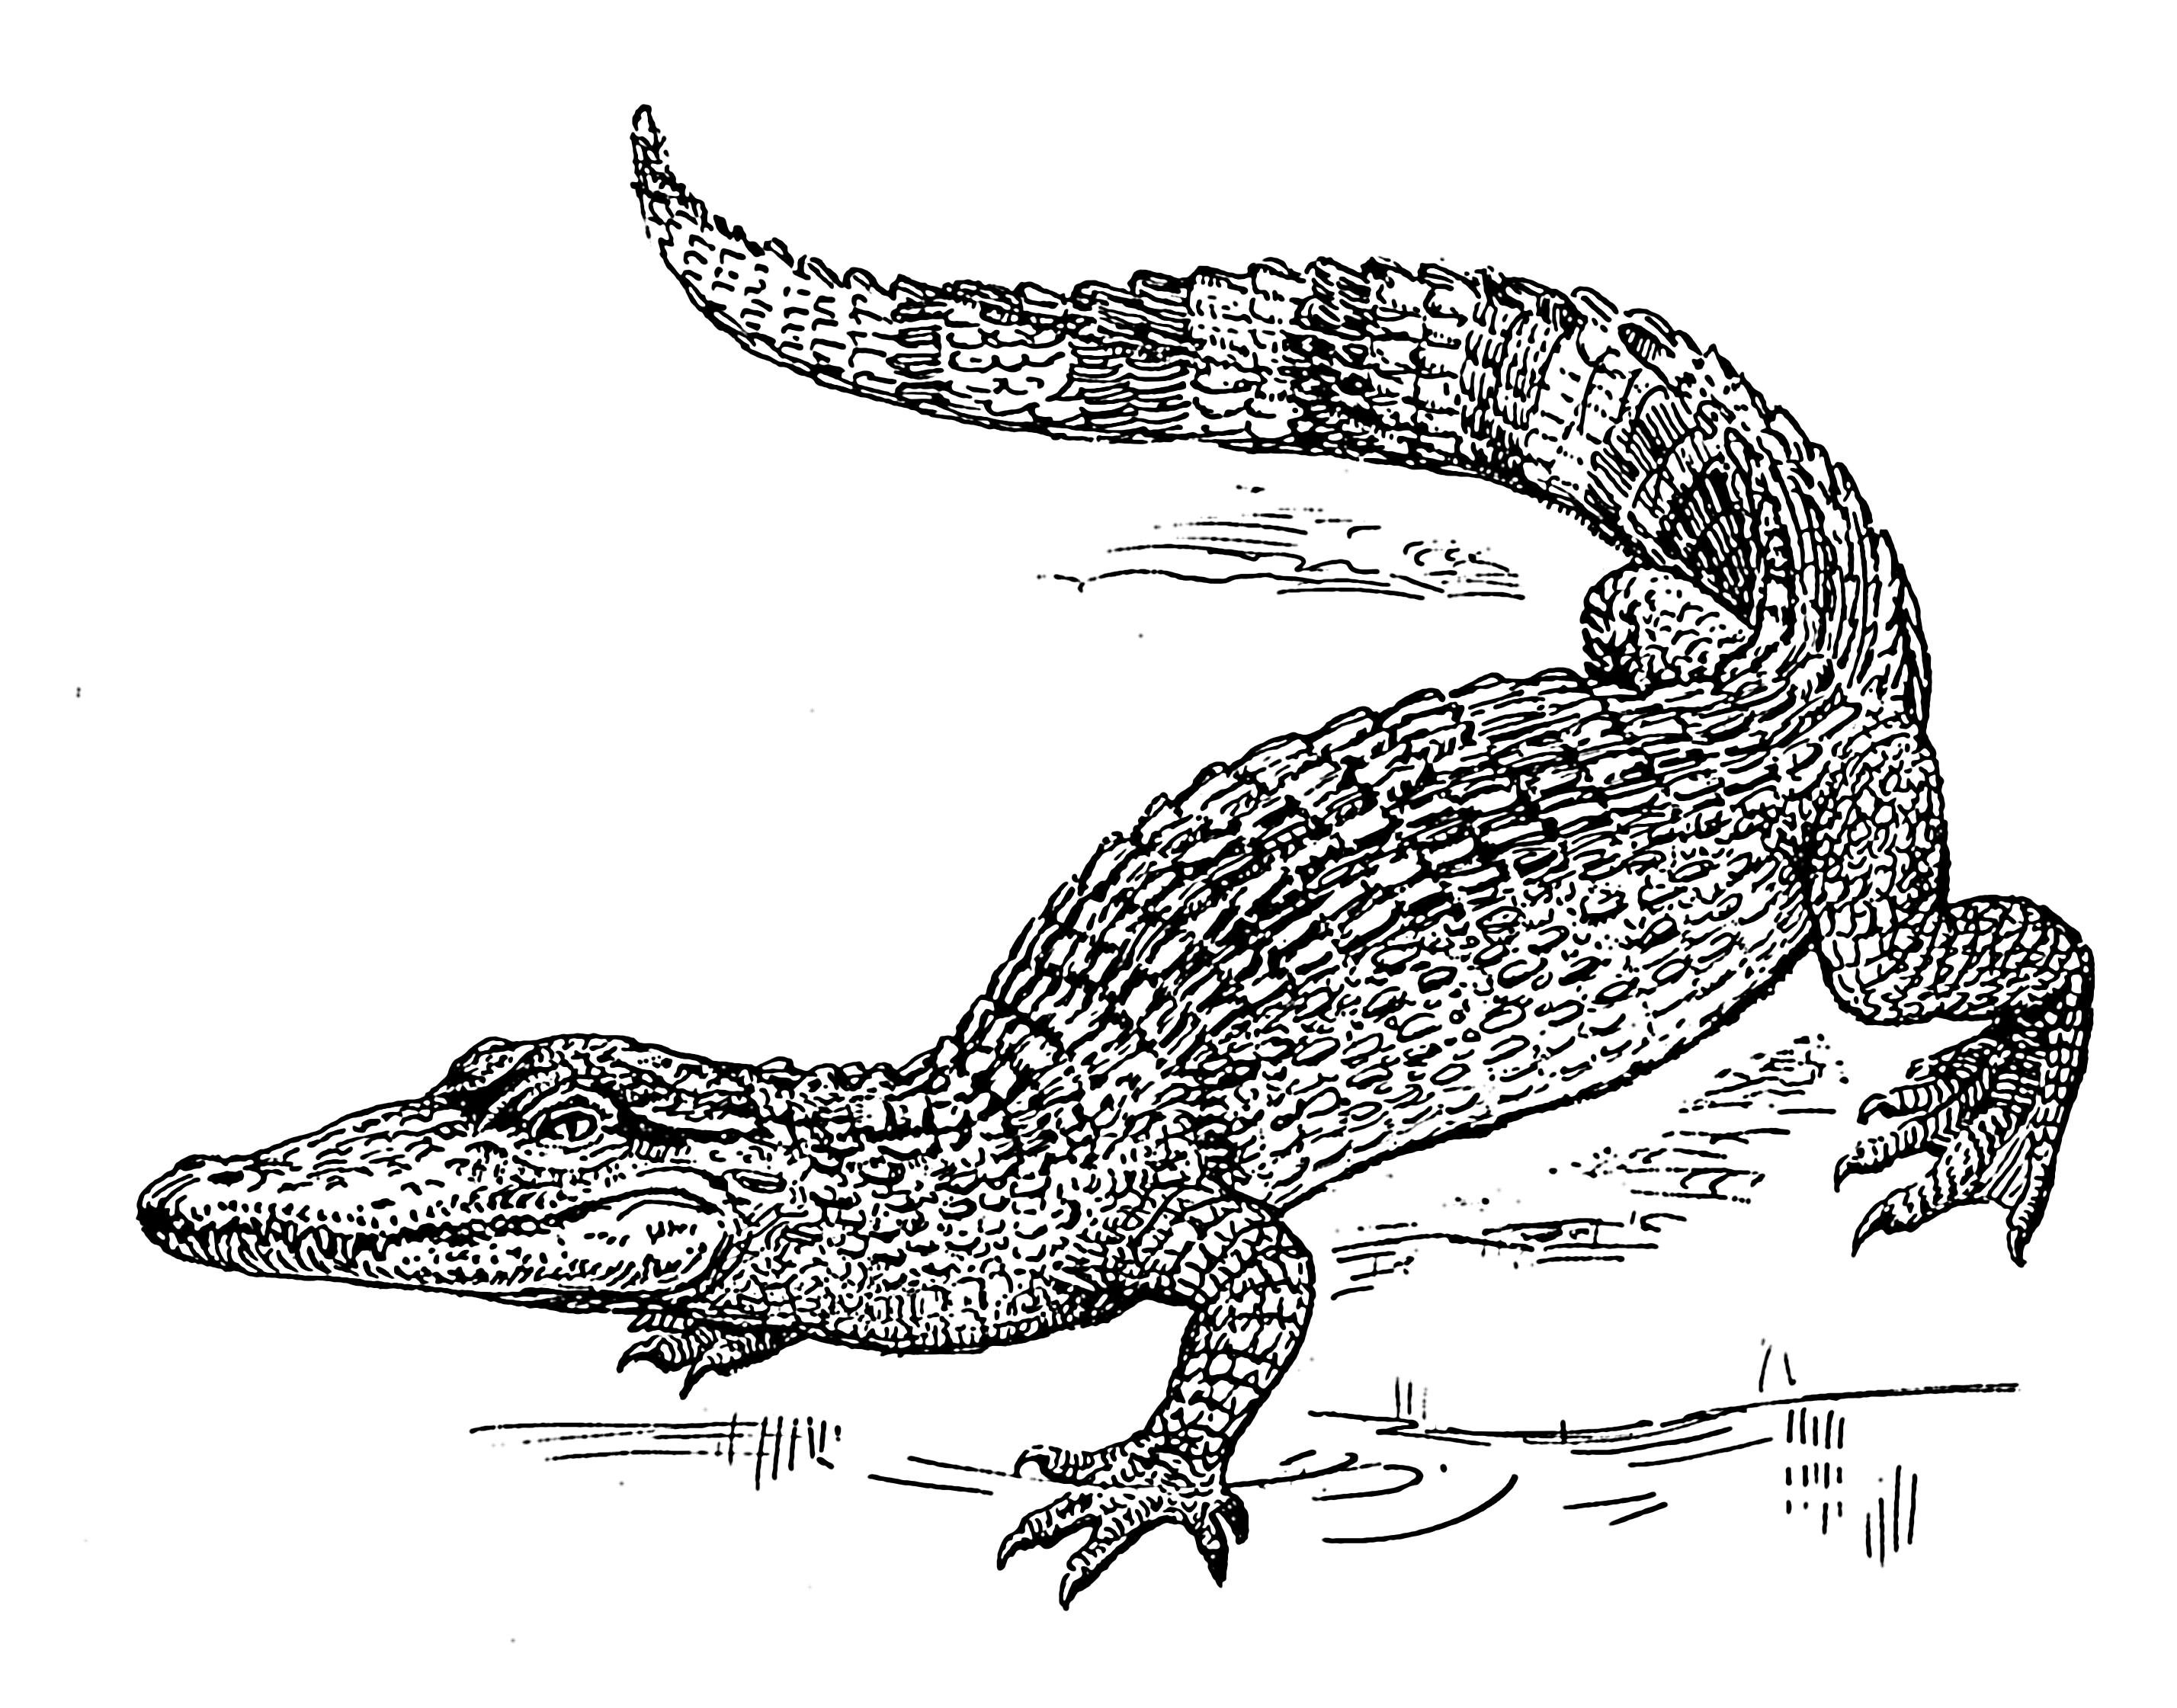 PNG Crocodile Black And White - 133437